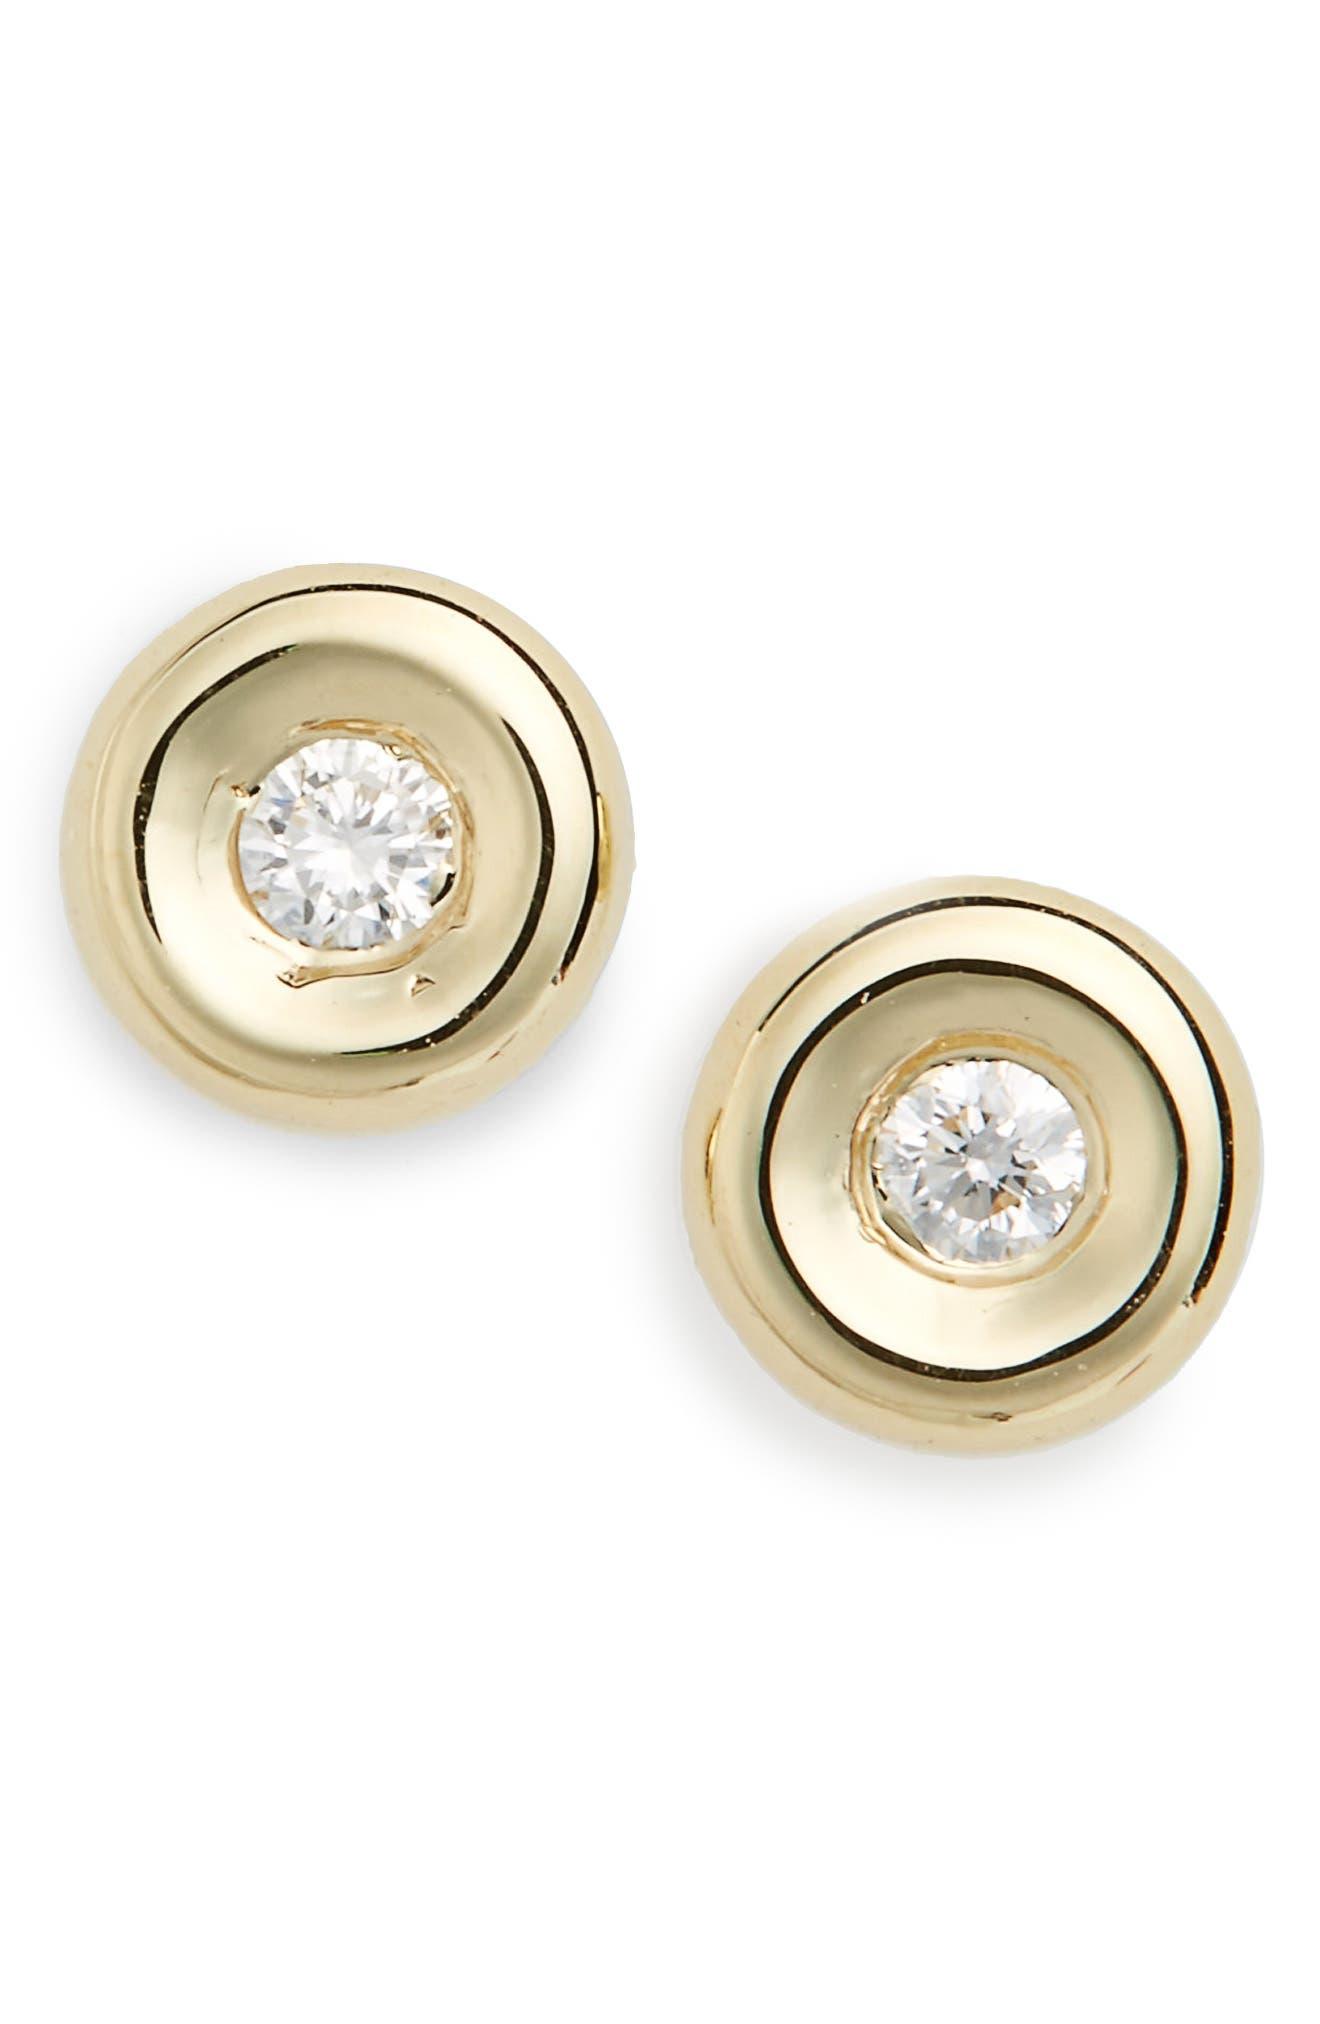 Tiny Treasures Diamond Stud Earrings,                             Main thumbnail 1, color,                             Yellow